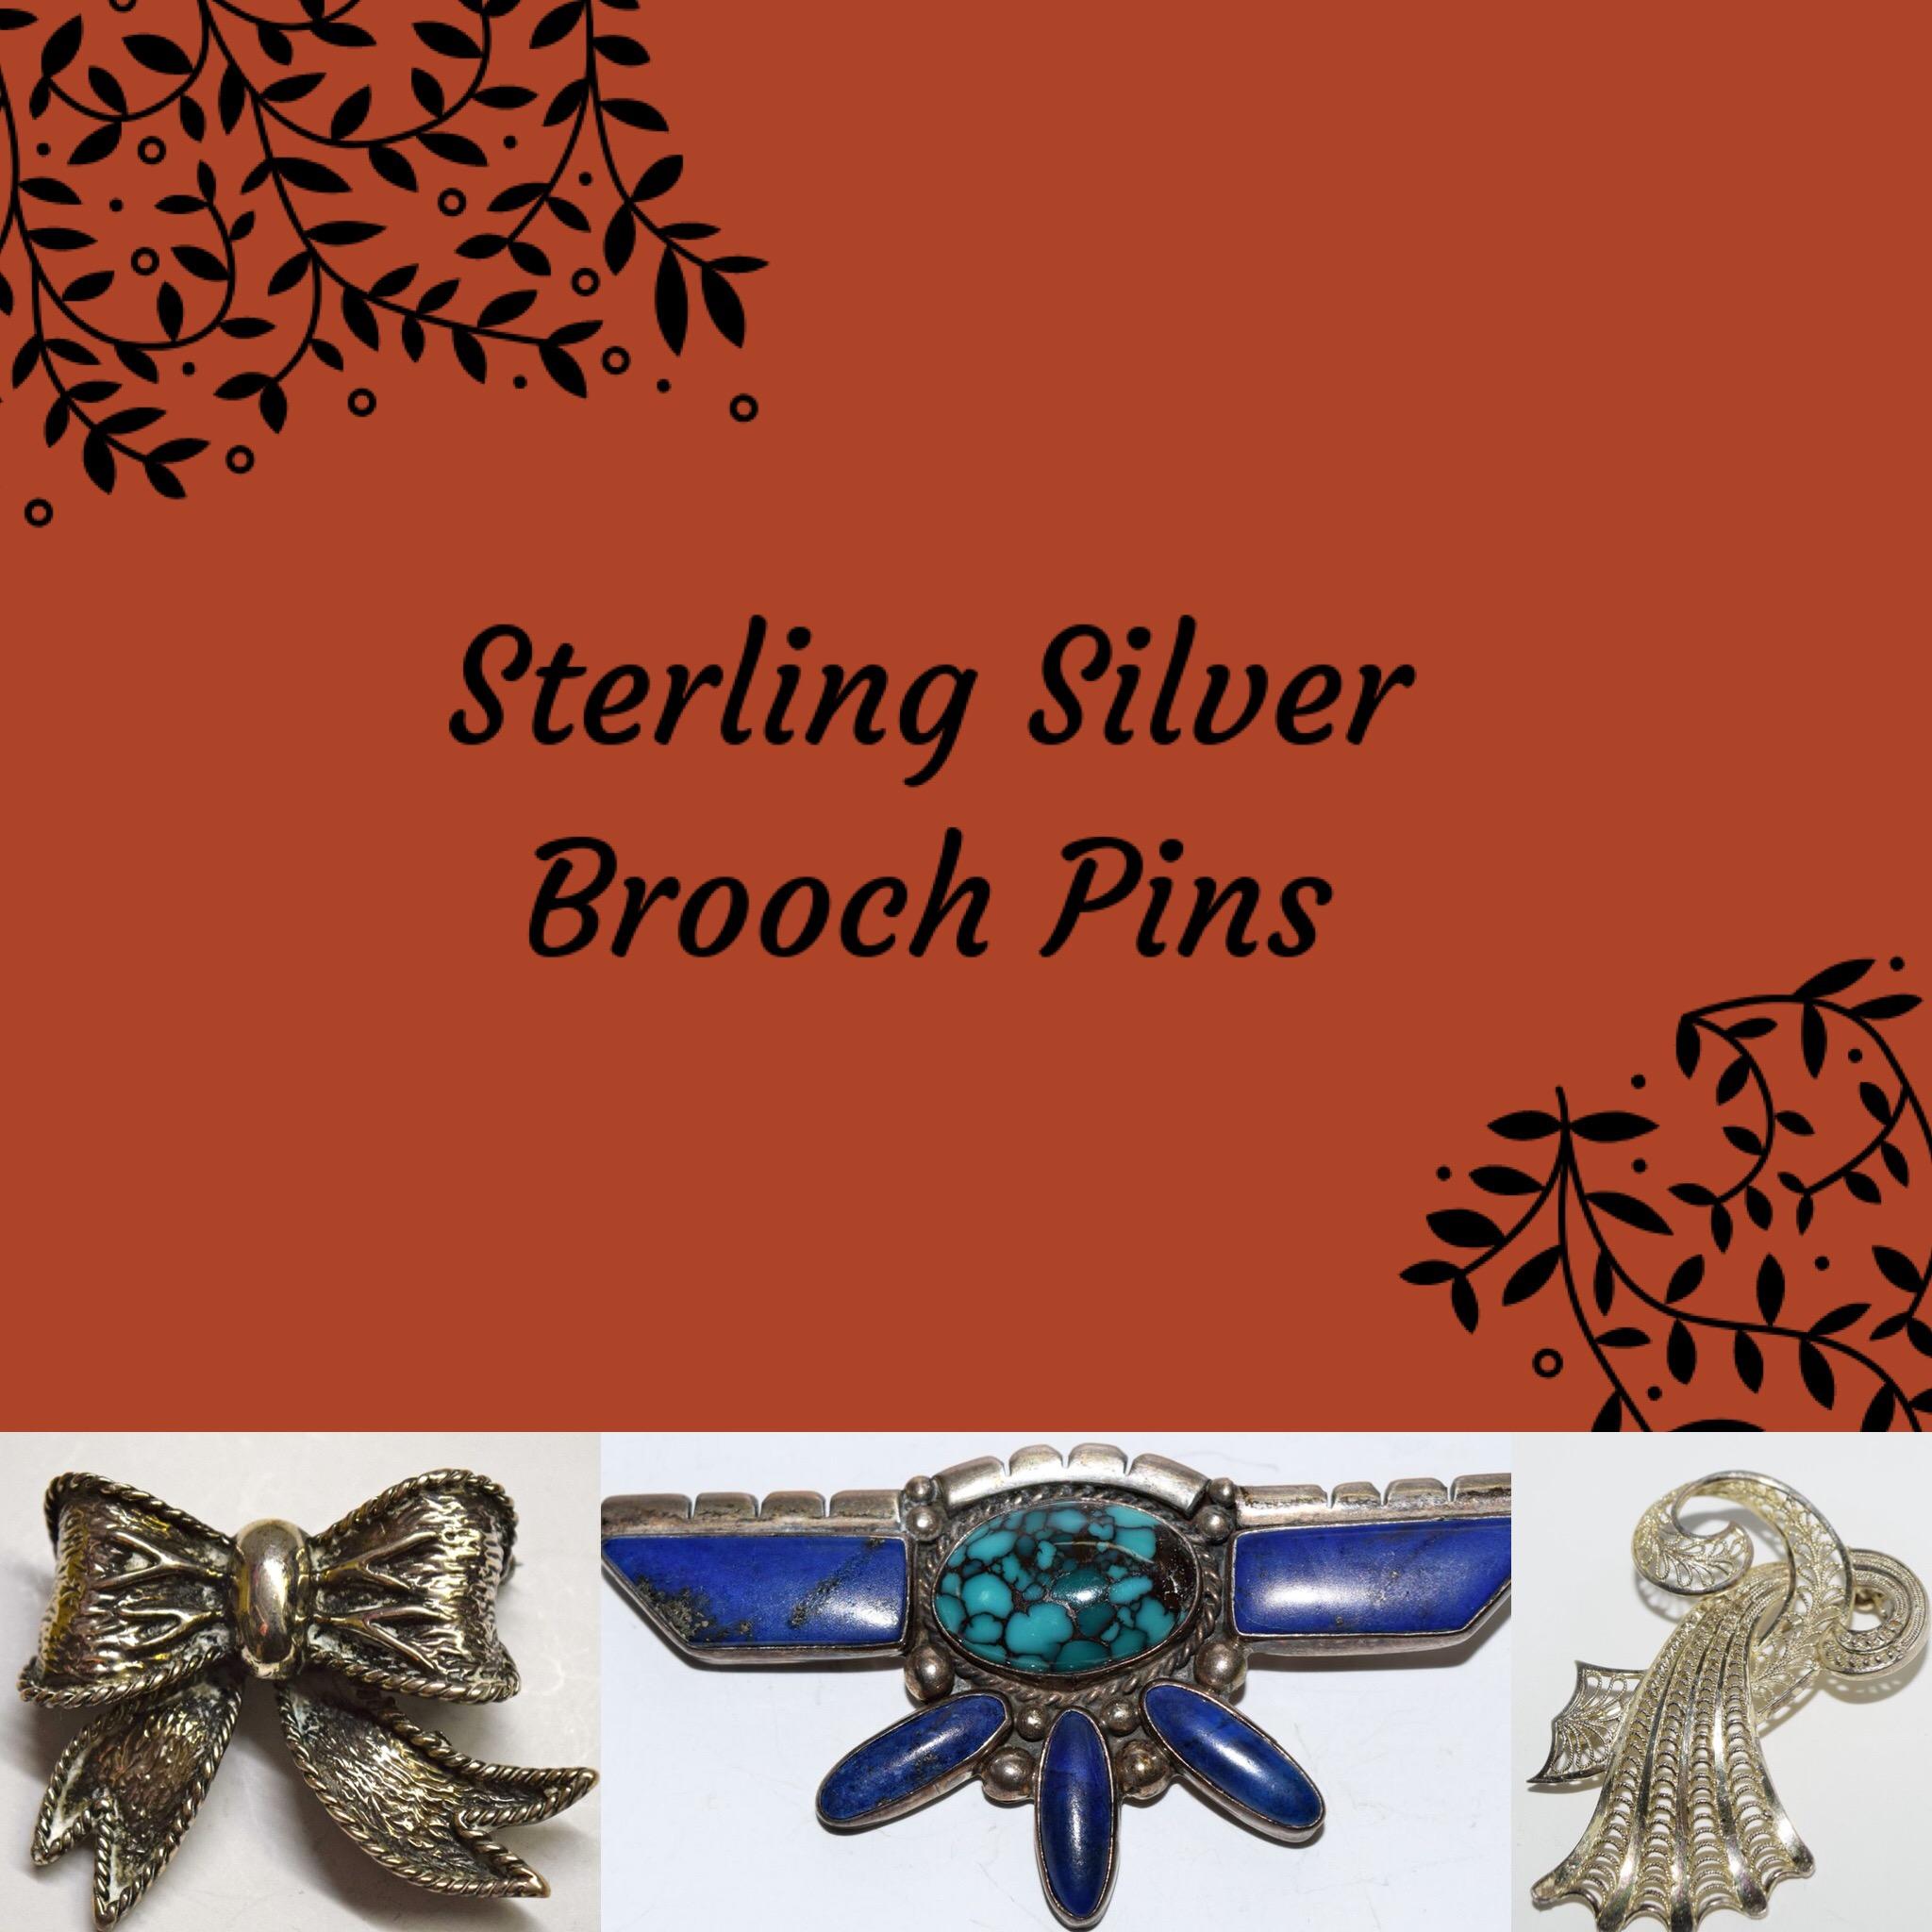 Sterling Silver Brooch Pins